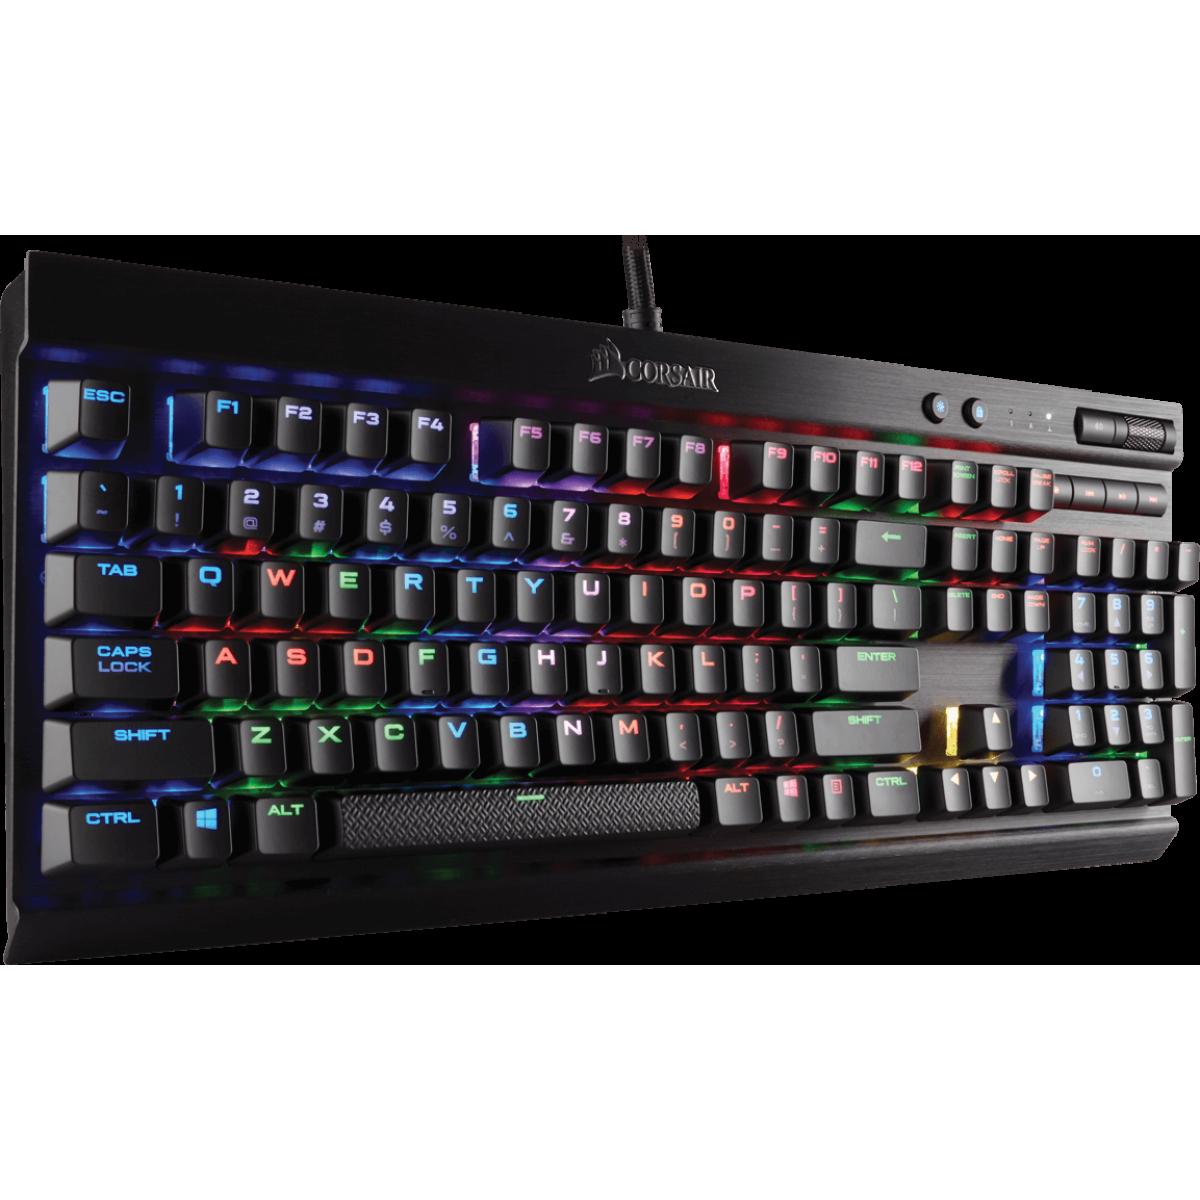 Teclado Mecânico  Gamer Corsair K70 Lux Switch Cherry Mx Rgb Red Ch-9101010-br Abnt2